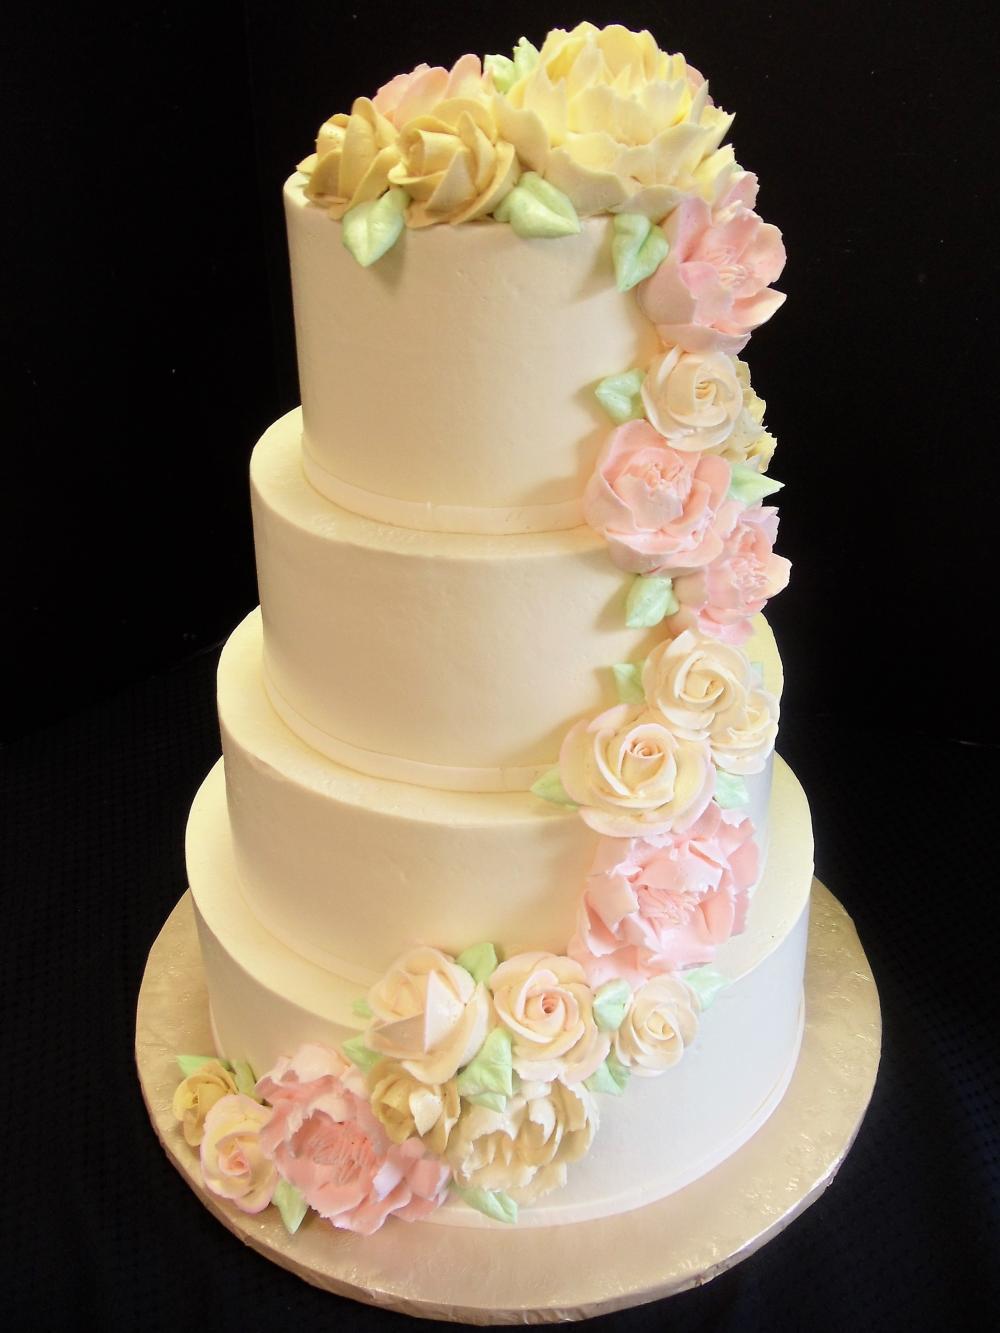 Wedding Cakes | The West Side Bakery